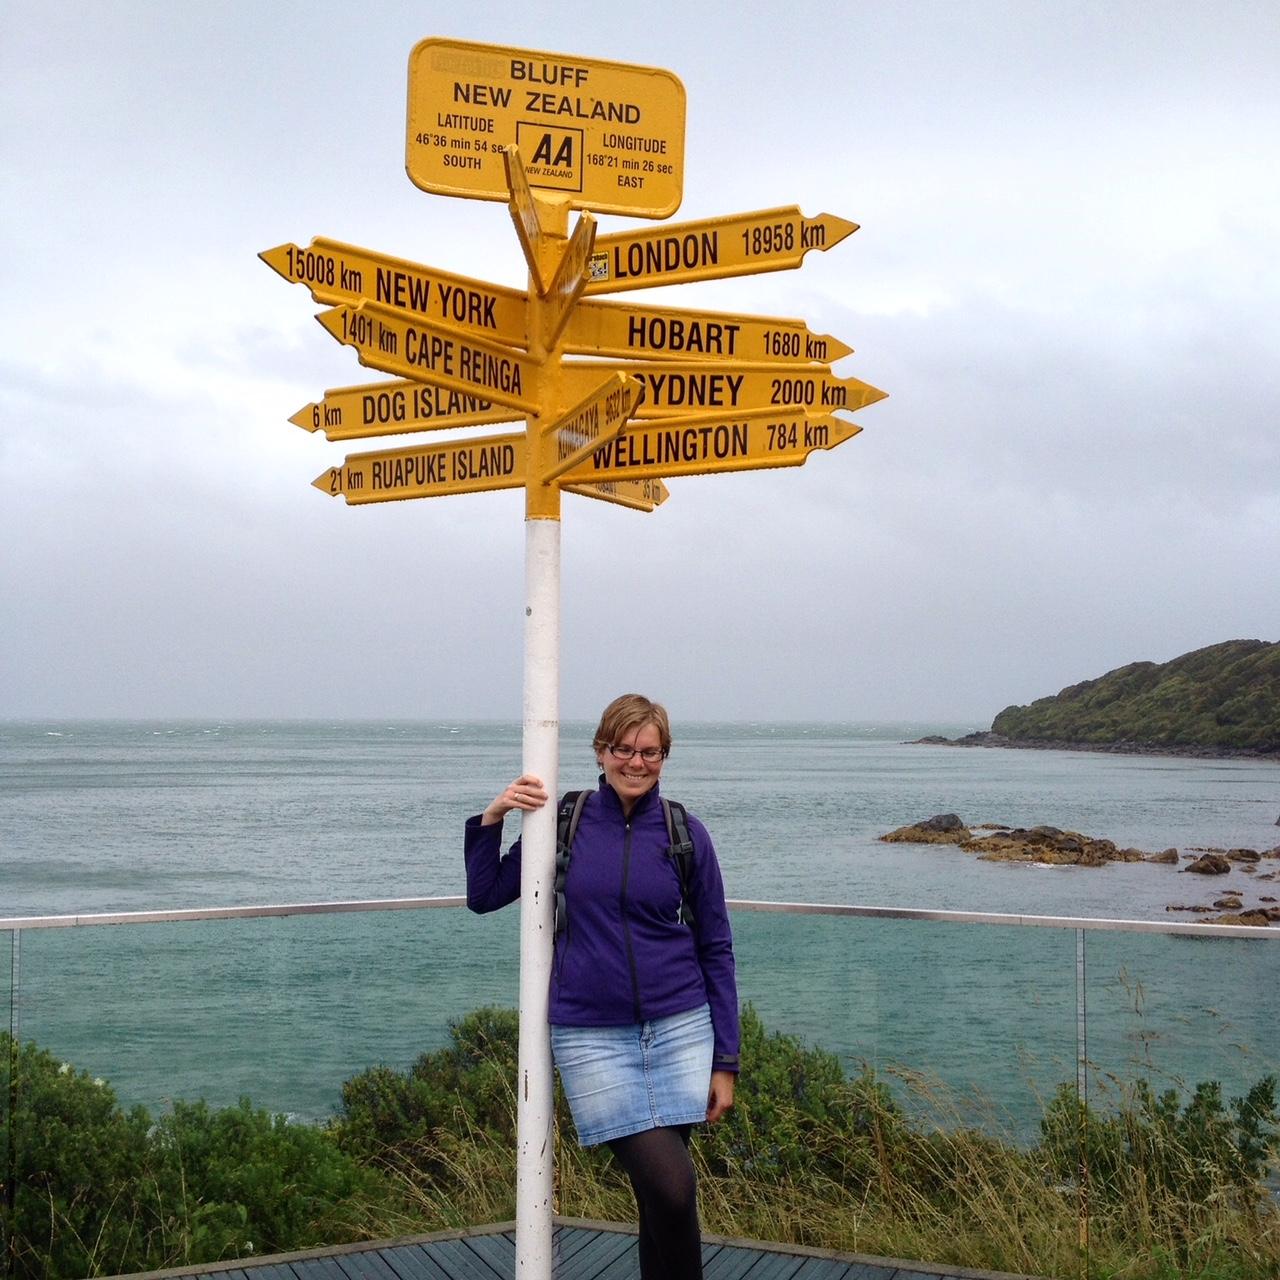 Bluff New Zealand